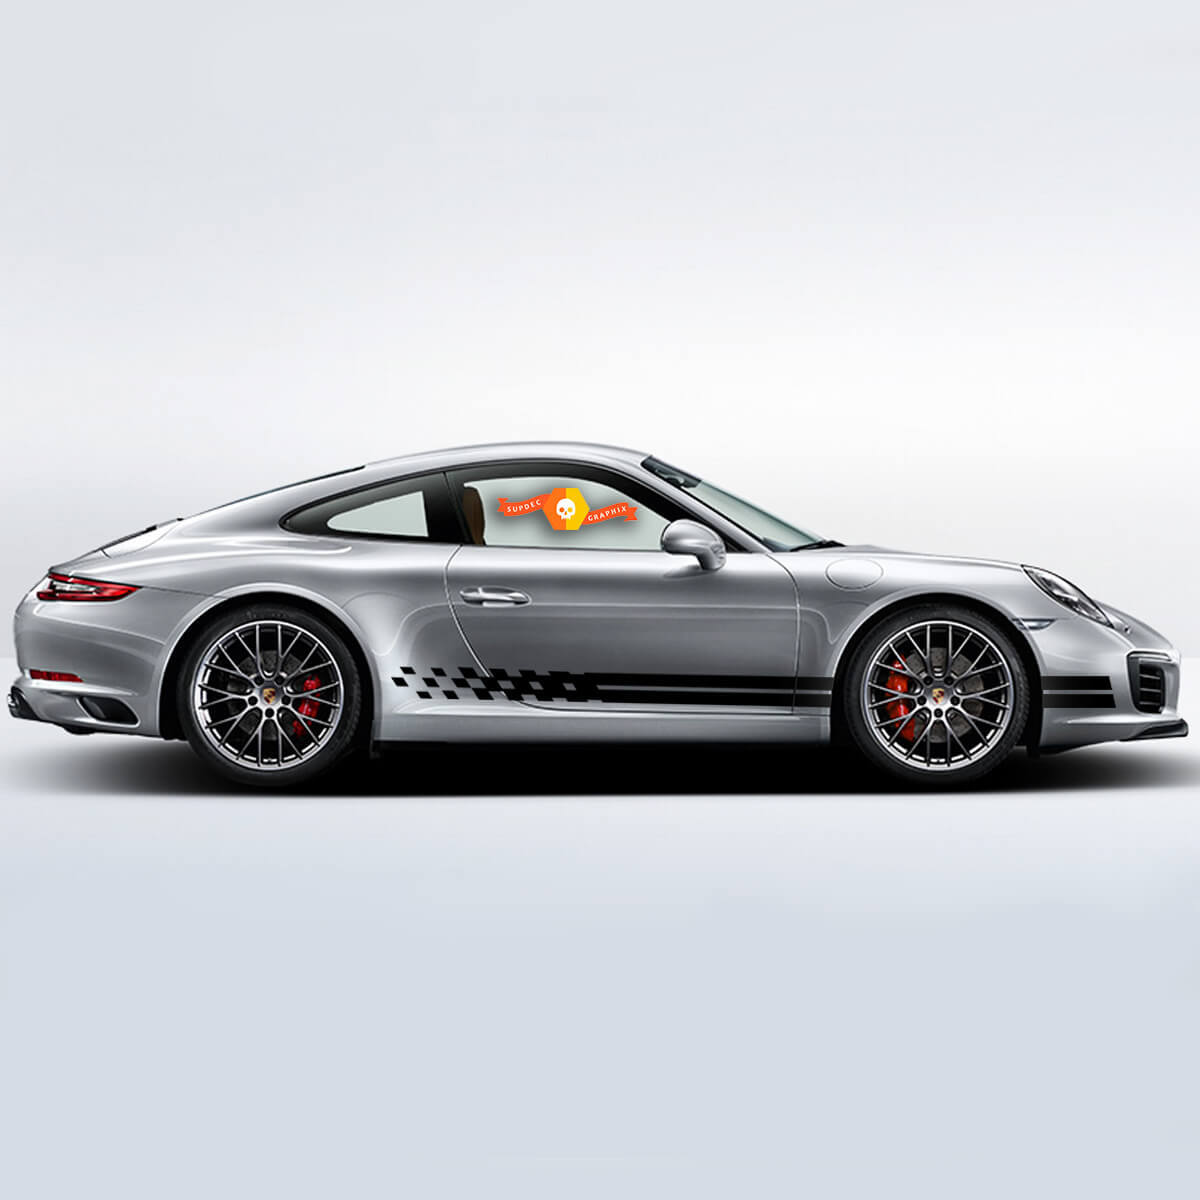 Porsche Kit Aufkleber Porsche 911 991 Carrera S Endurance Racing Edition Seitenstreifen Kit Aufkleber